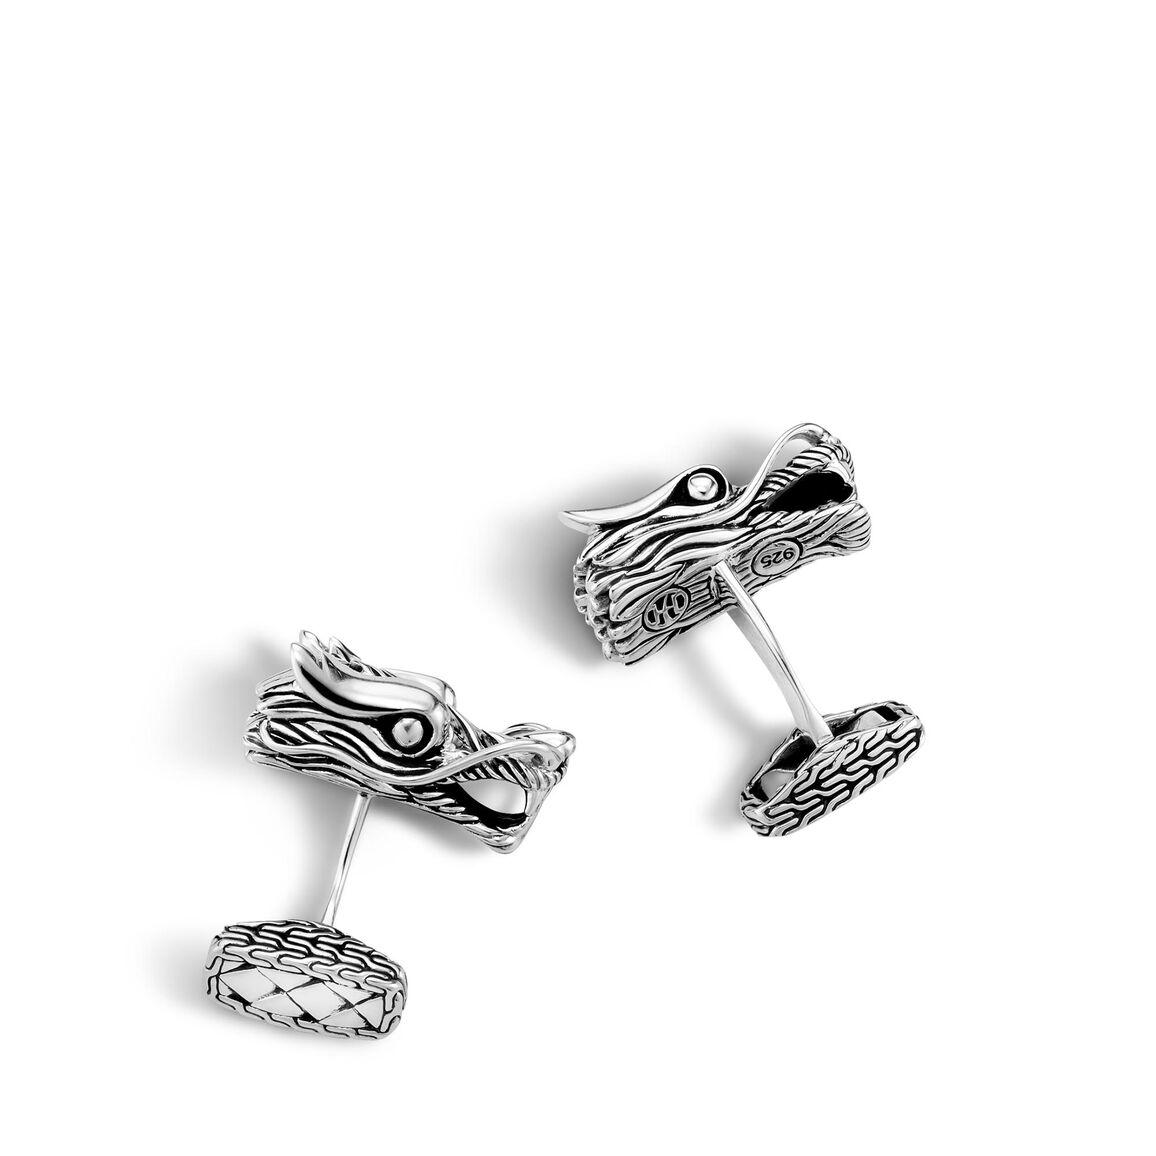 Legends Naga Head Cufflinks in Silver